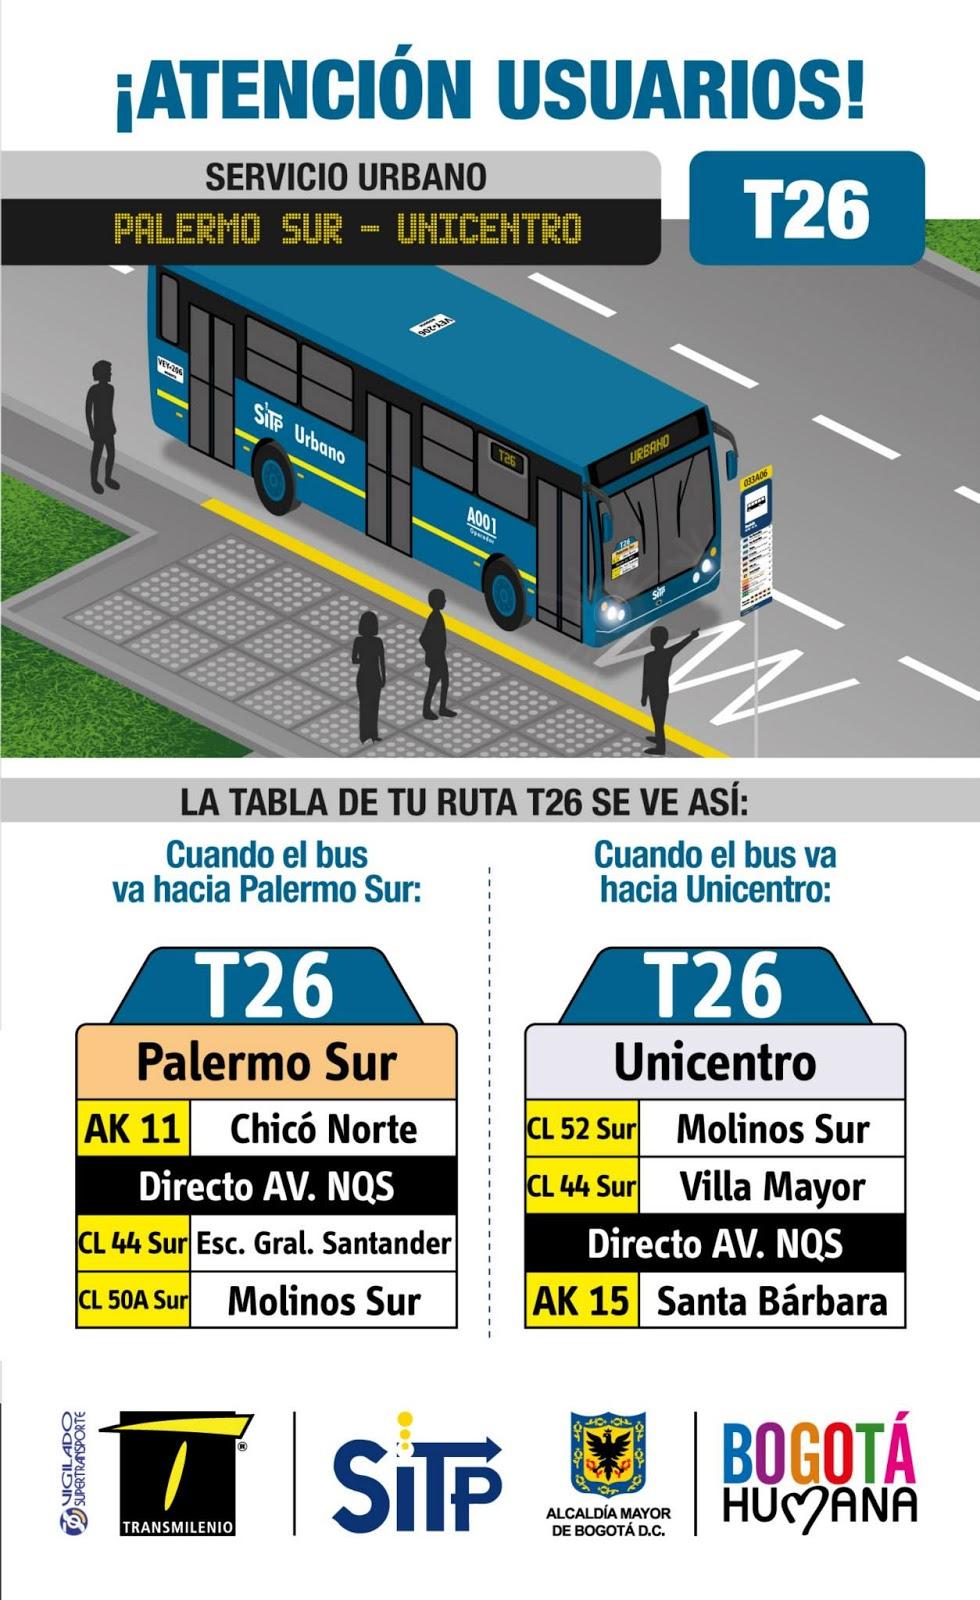 Nueva ruta urbana T26, por la carrera 30 2